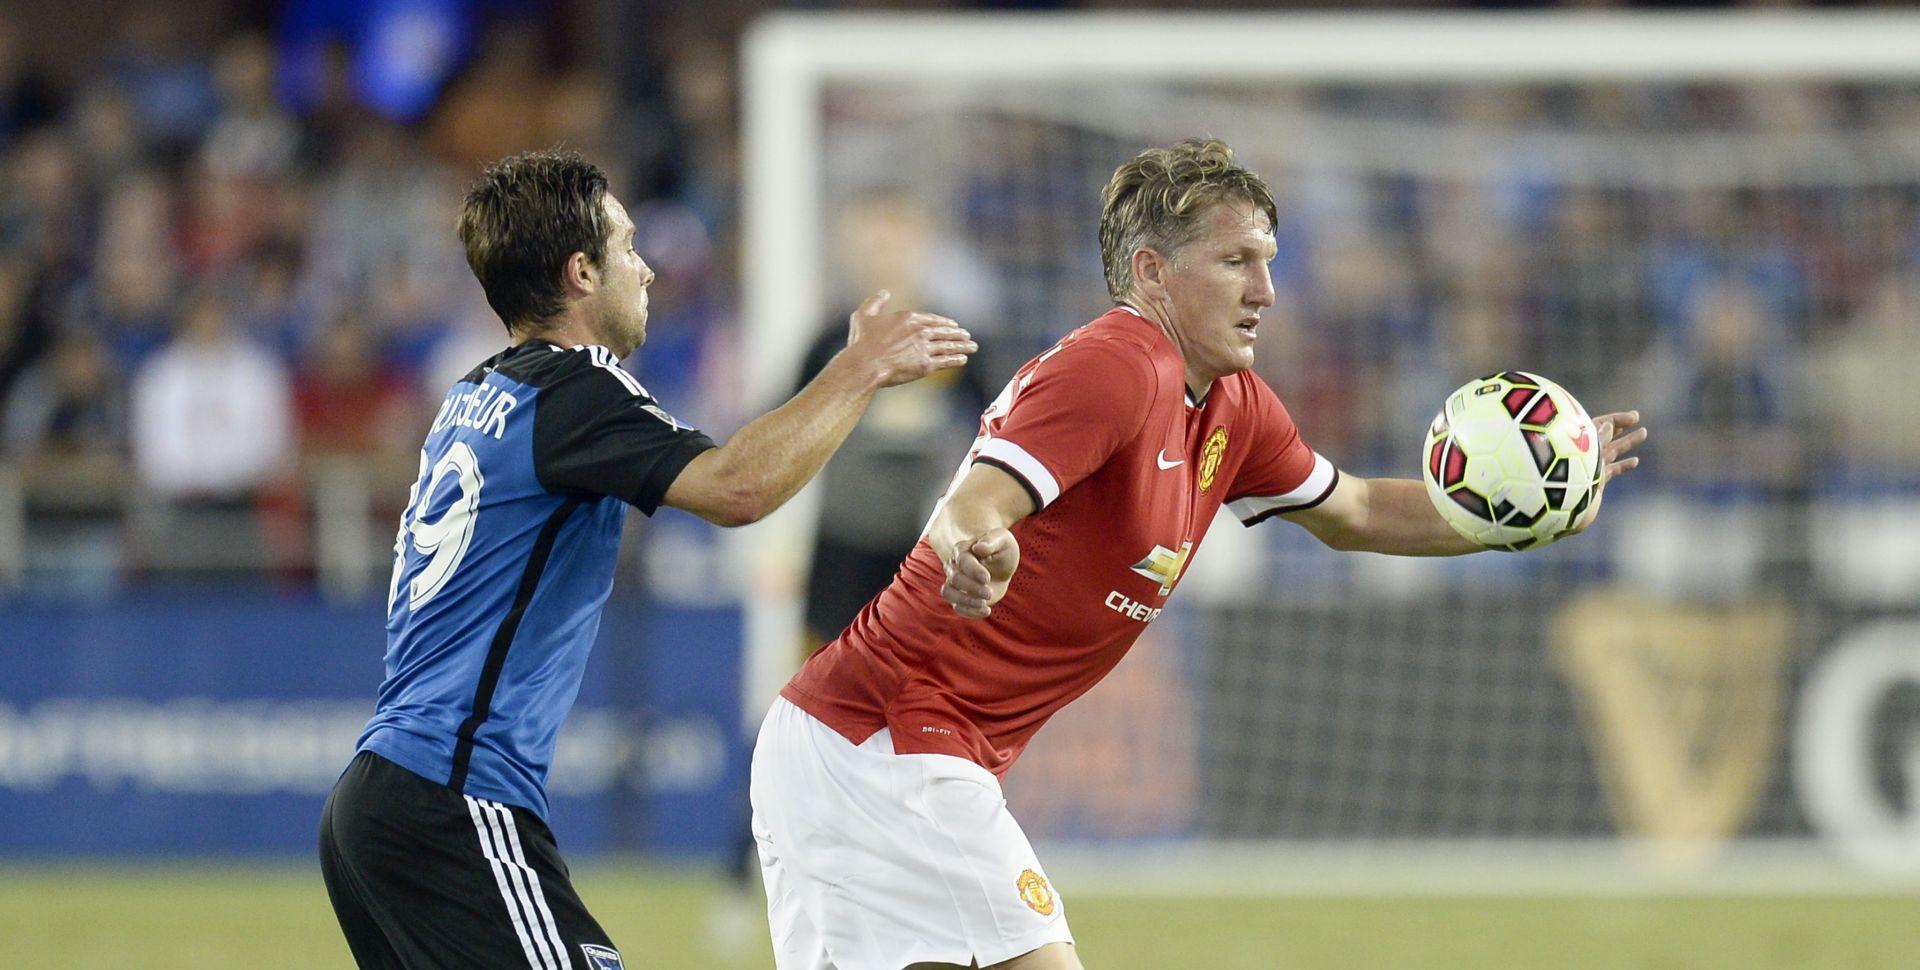 BILD Schweinsteiger u United ipak otišao za 'siću'?